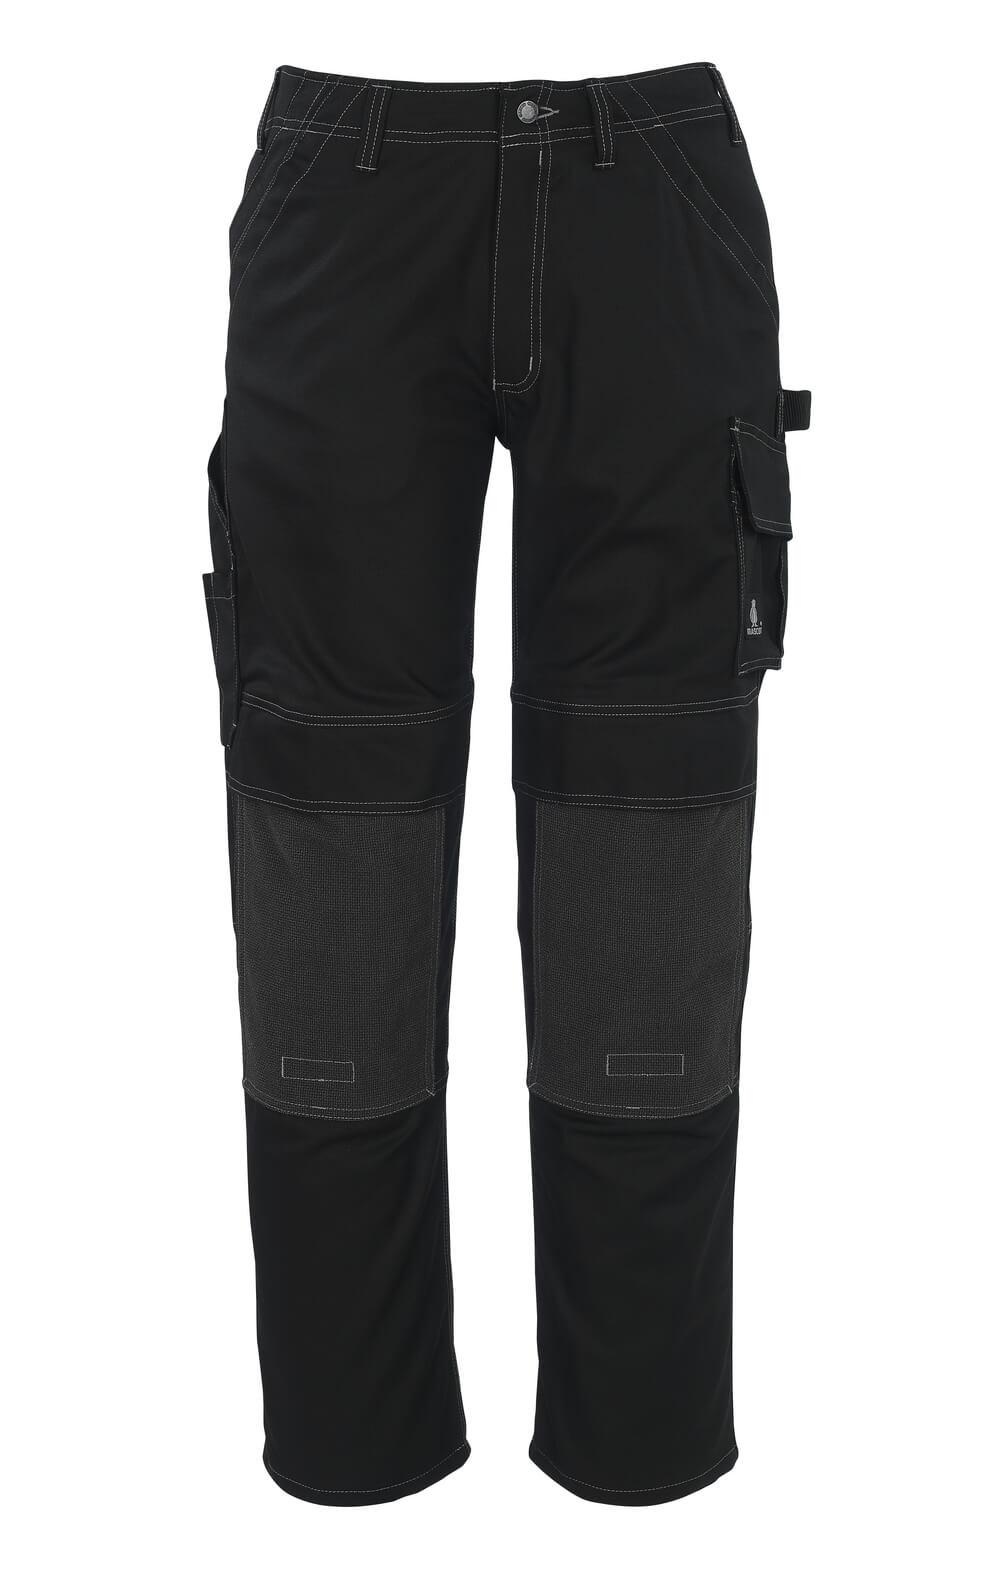 05079-010-09 Pants with kneepad pockets - black